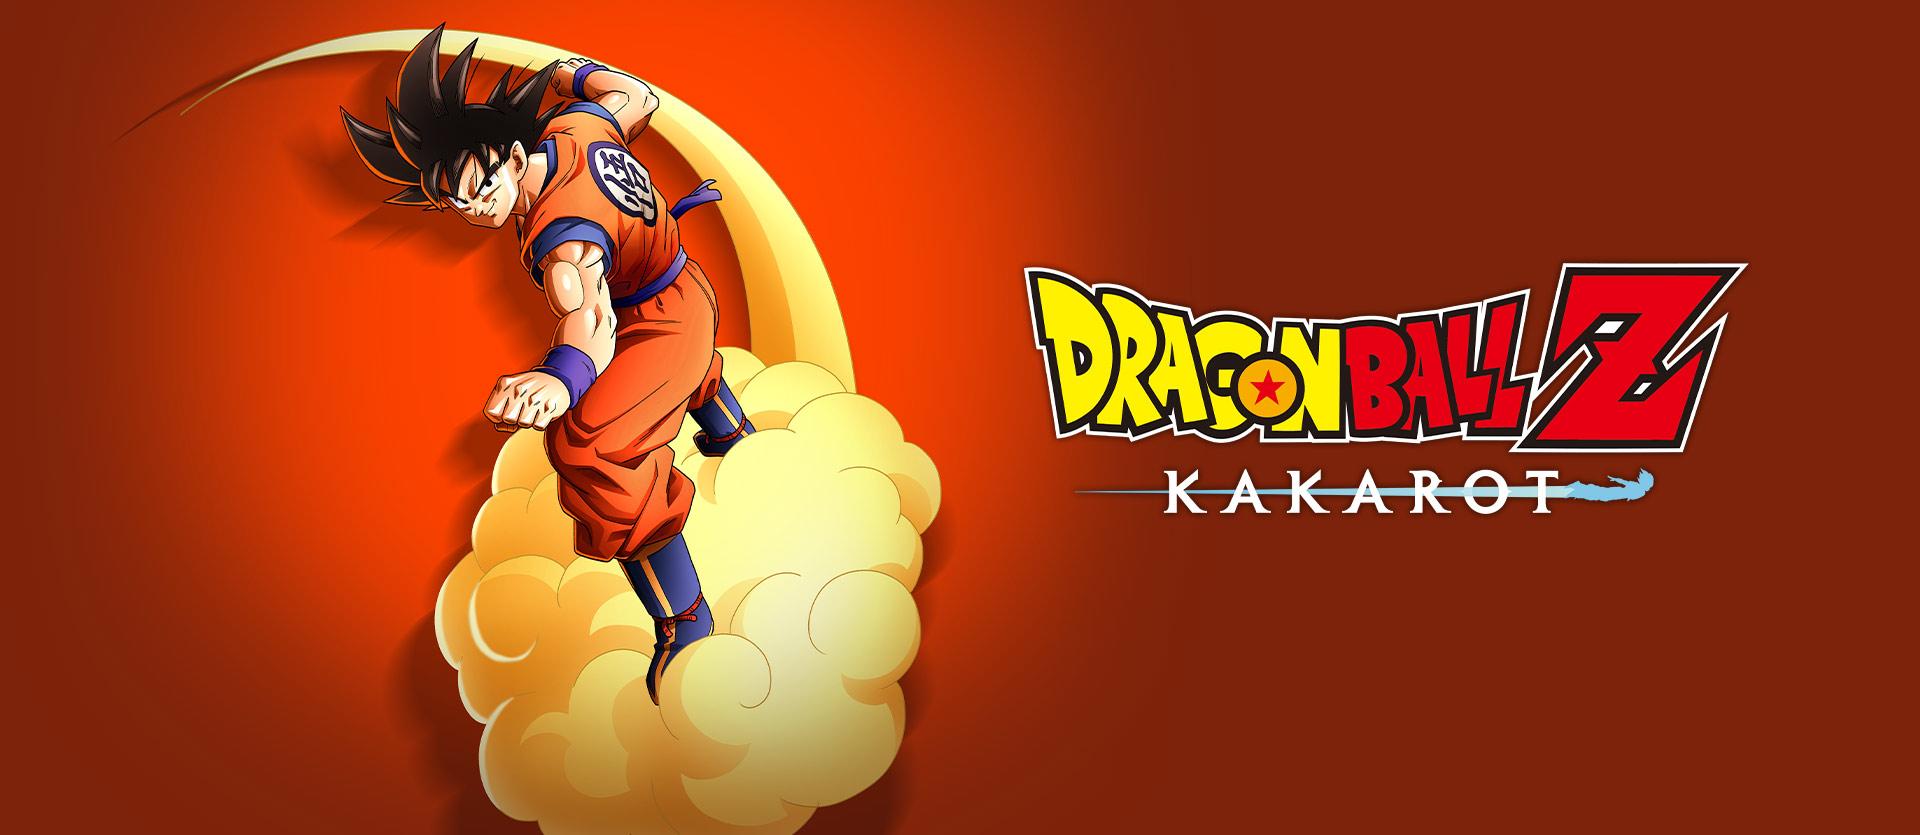 Постер Dragon Ball Z: Kakarot